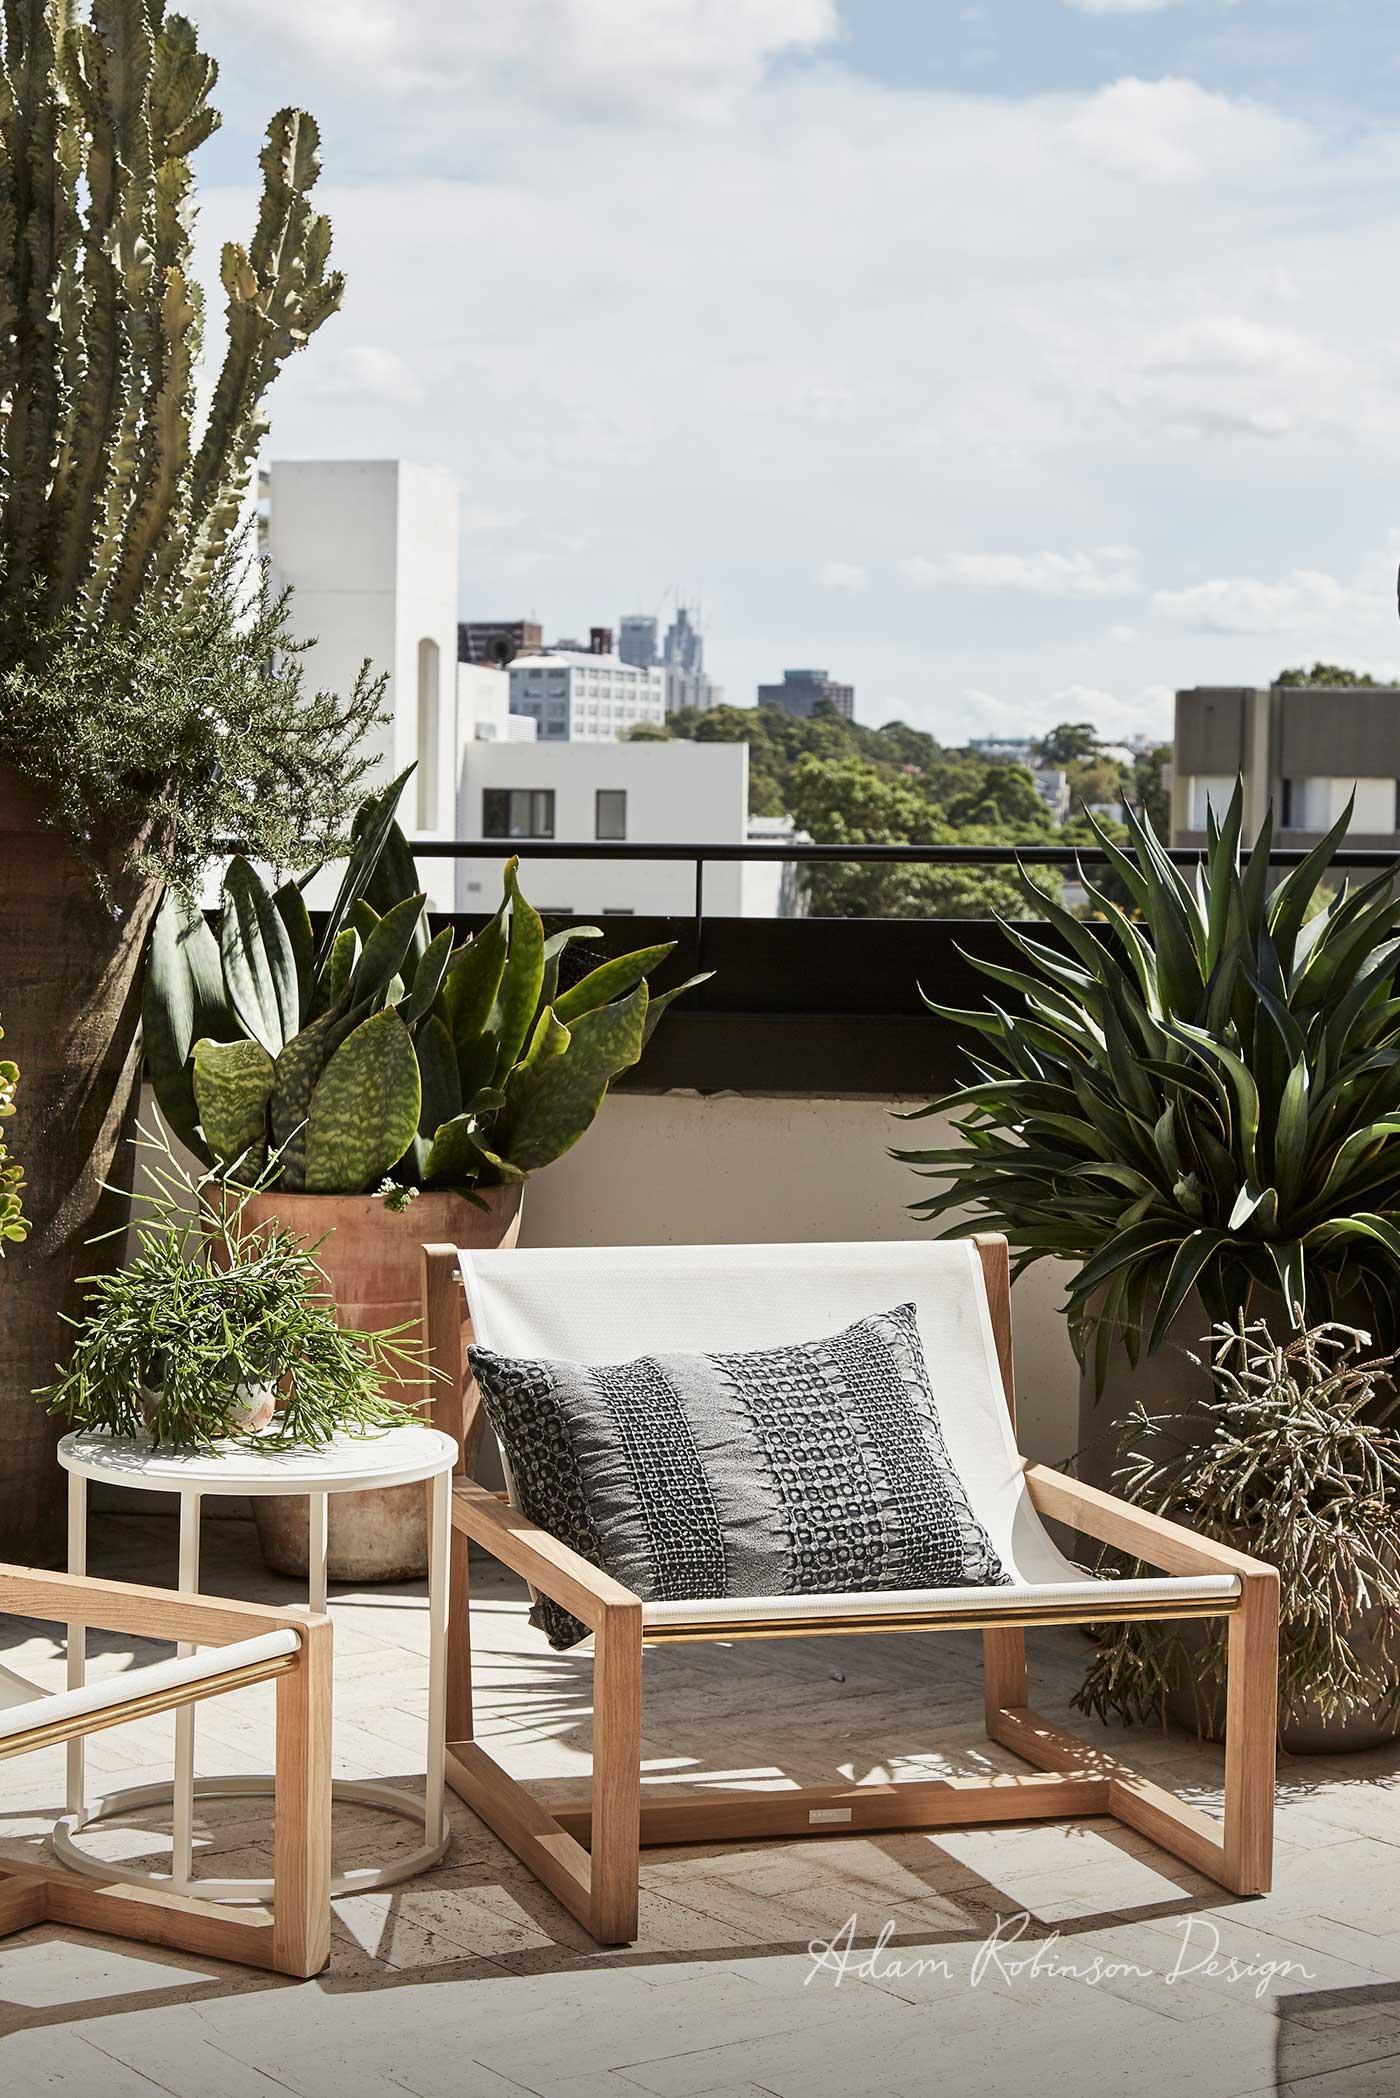 ©-Adam-Robinson-Design-Collaboration-Harbour-Outdoor-1976-One-Balcony-Four-Ways-COASTAL 2.jpg